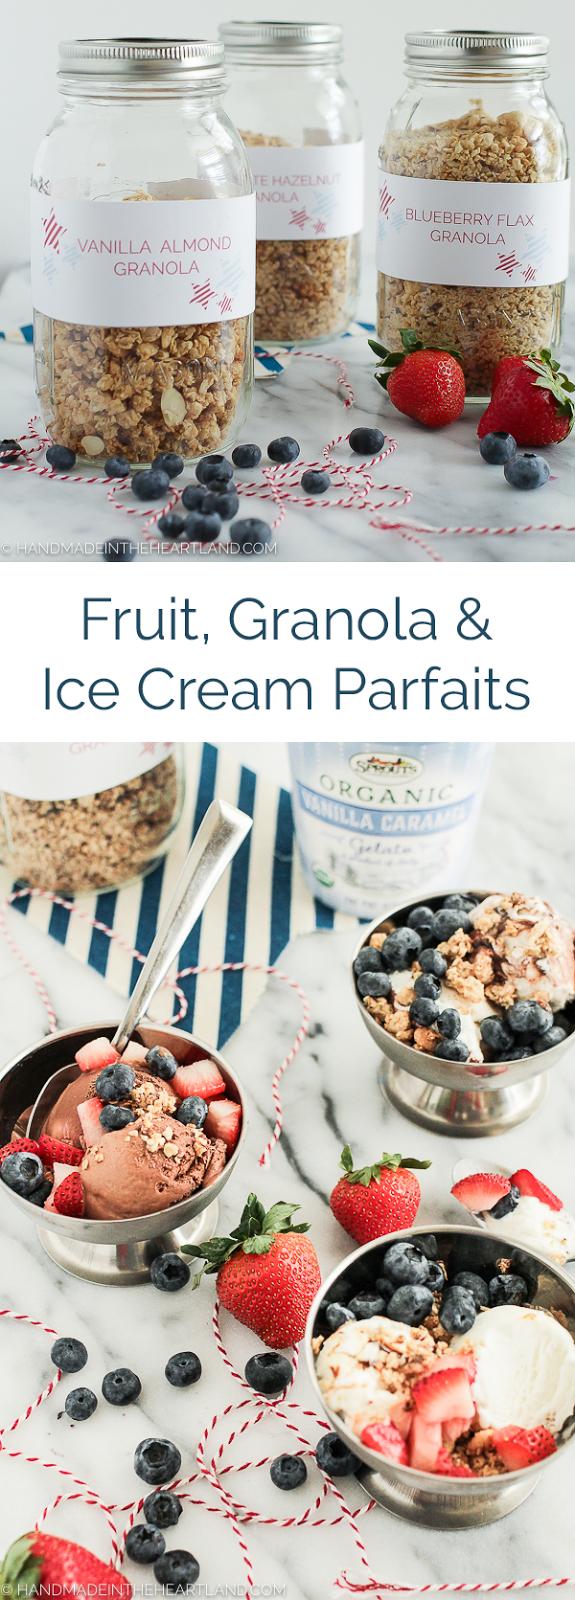 July 4th Ice Cream Parfait